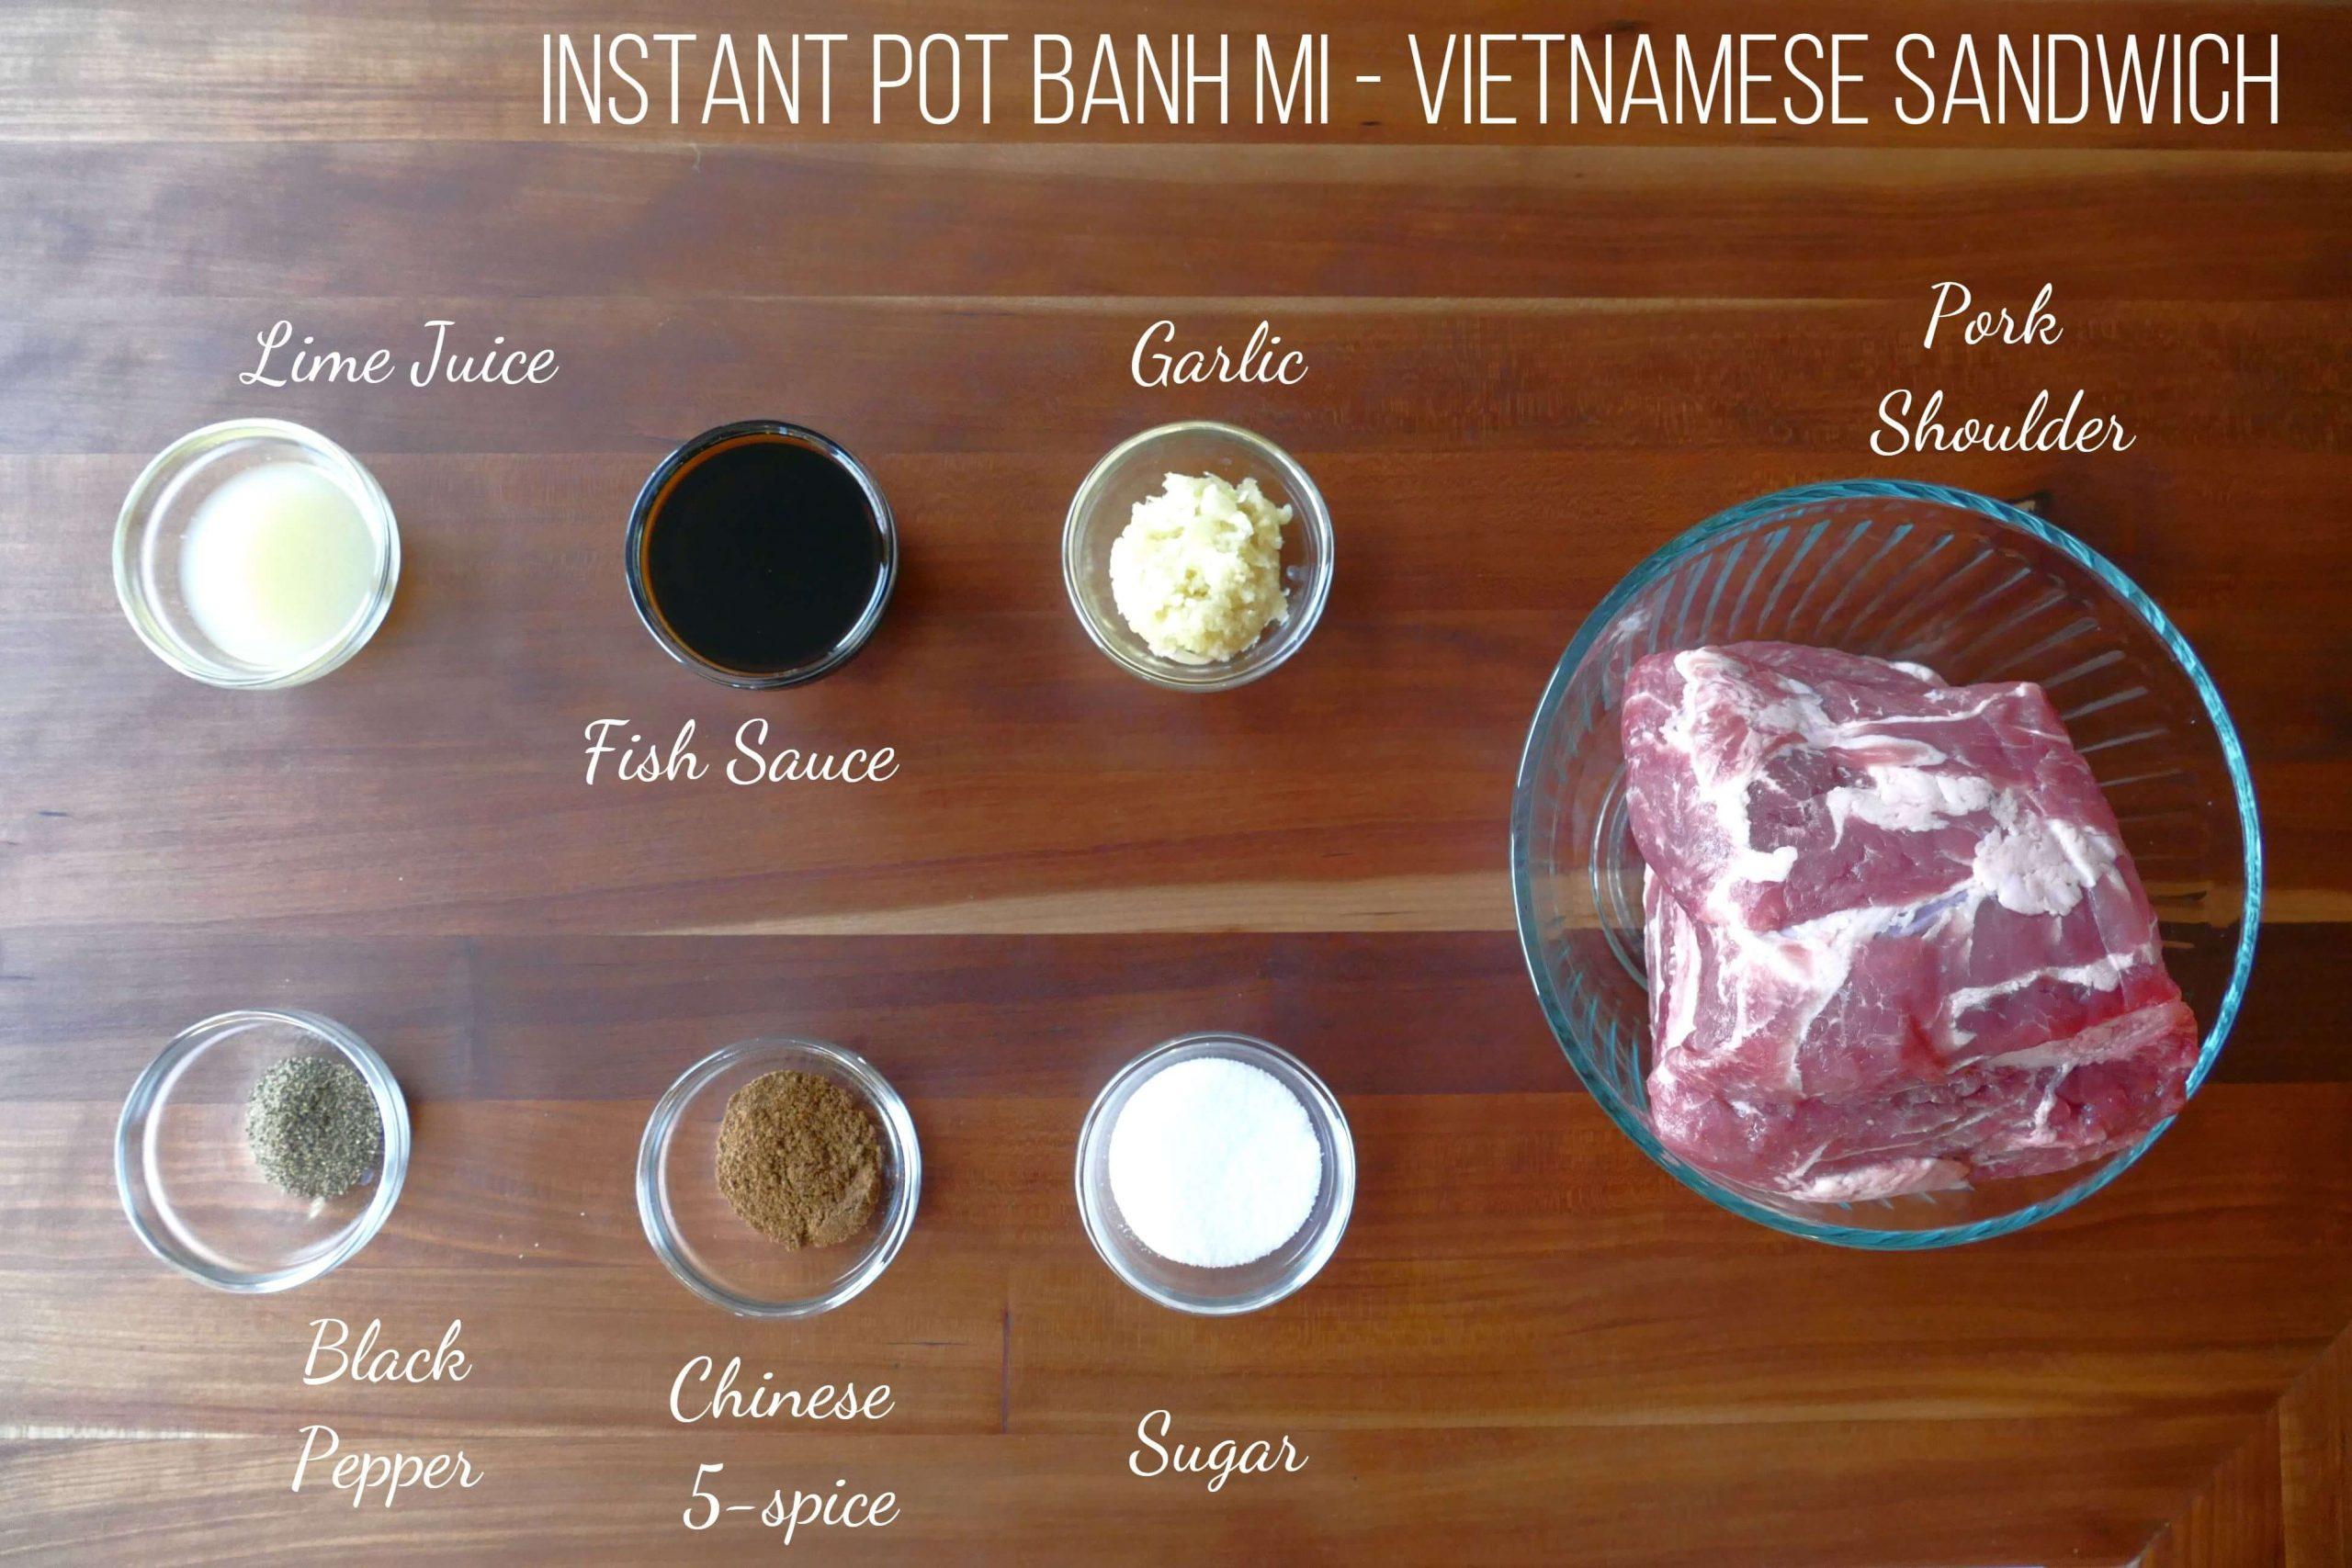 Instant Pot Banh Mi Ingredient List - Paint the Kitchen Red